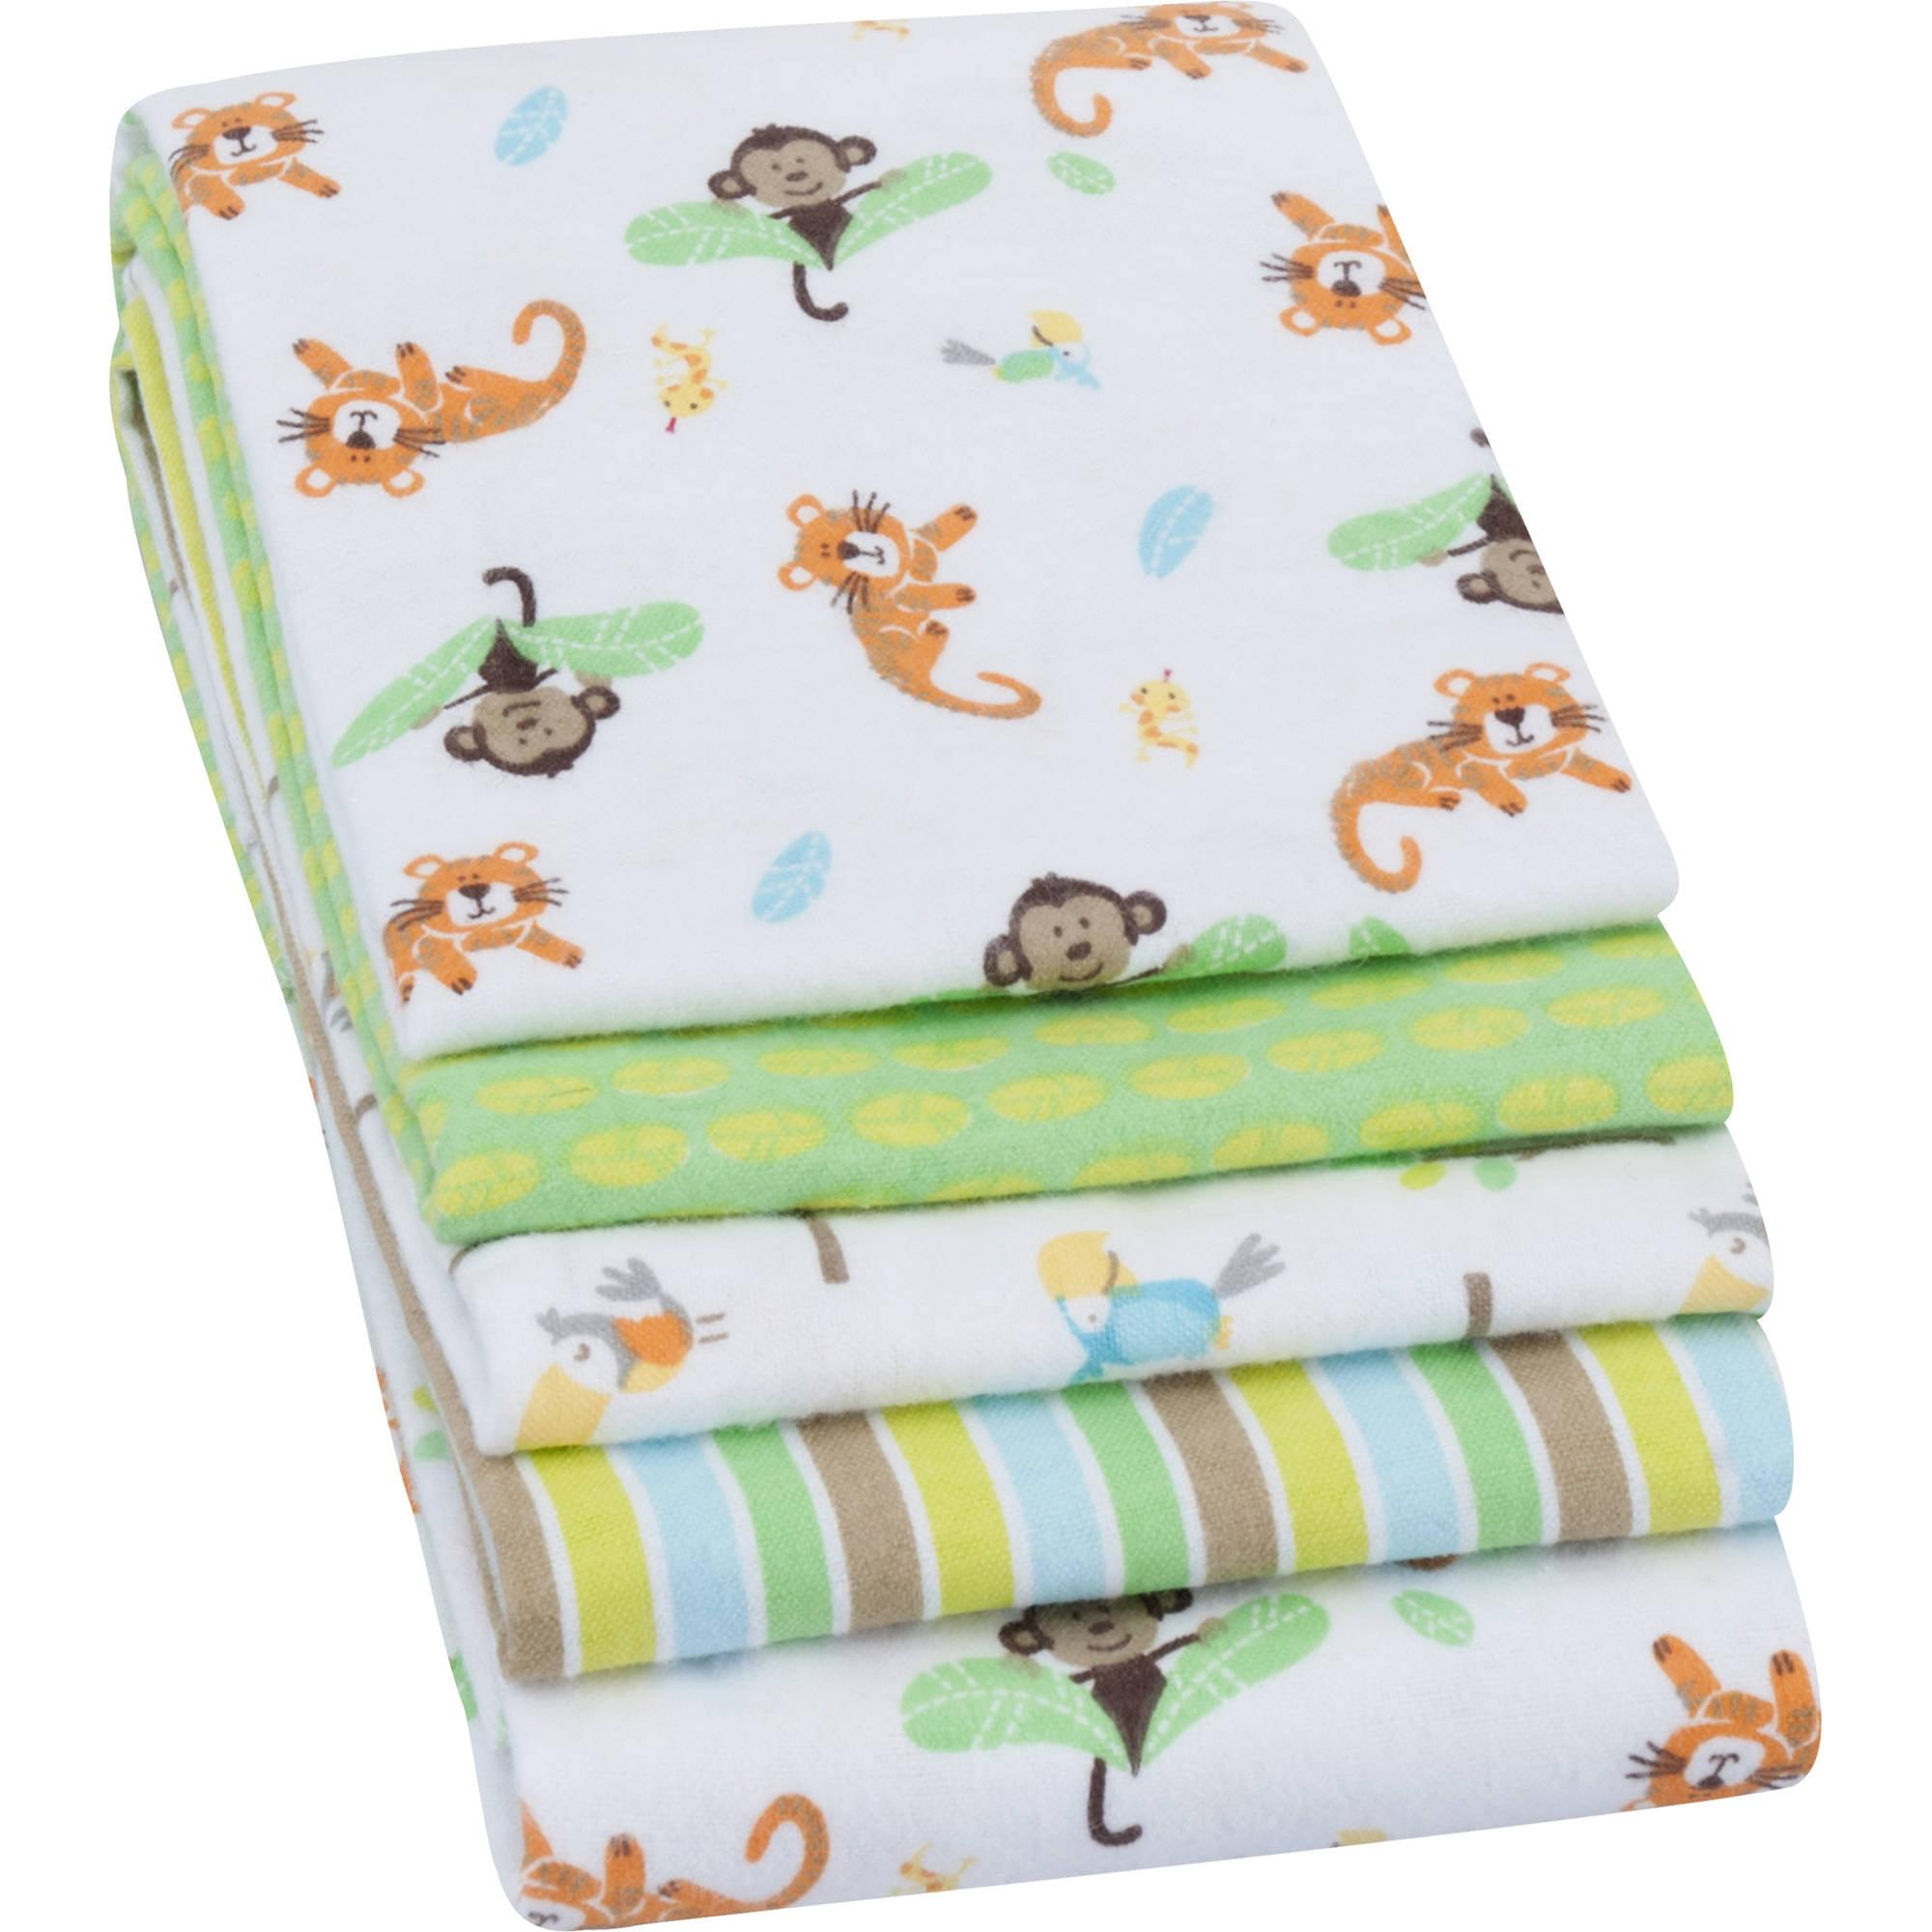 Garanimals Receiving Blankets, Green, 4 Pack